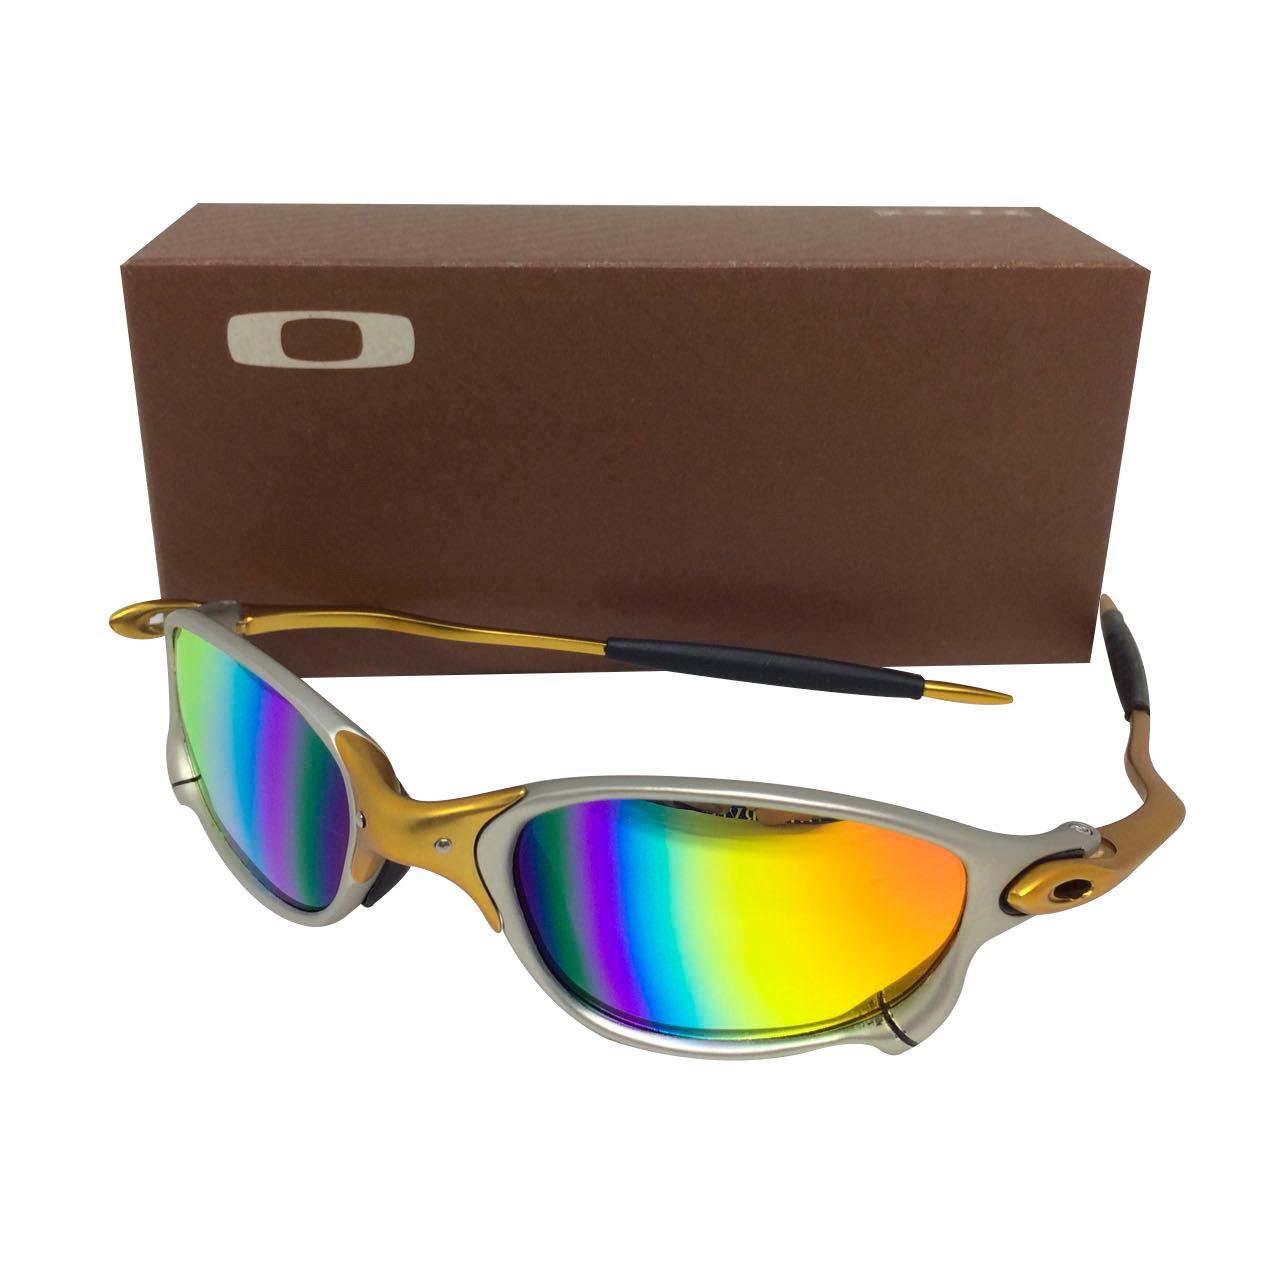 Oakley Juliet Arco Iris - Venha comprar óculos de sol Oakley Juliet Arco Iris na Madame Juliet